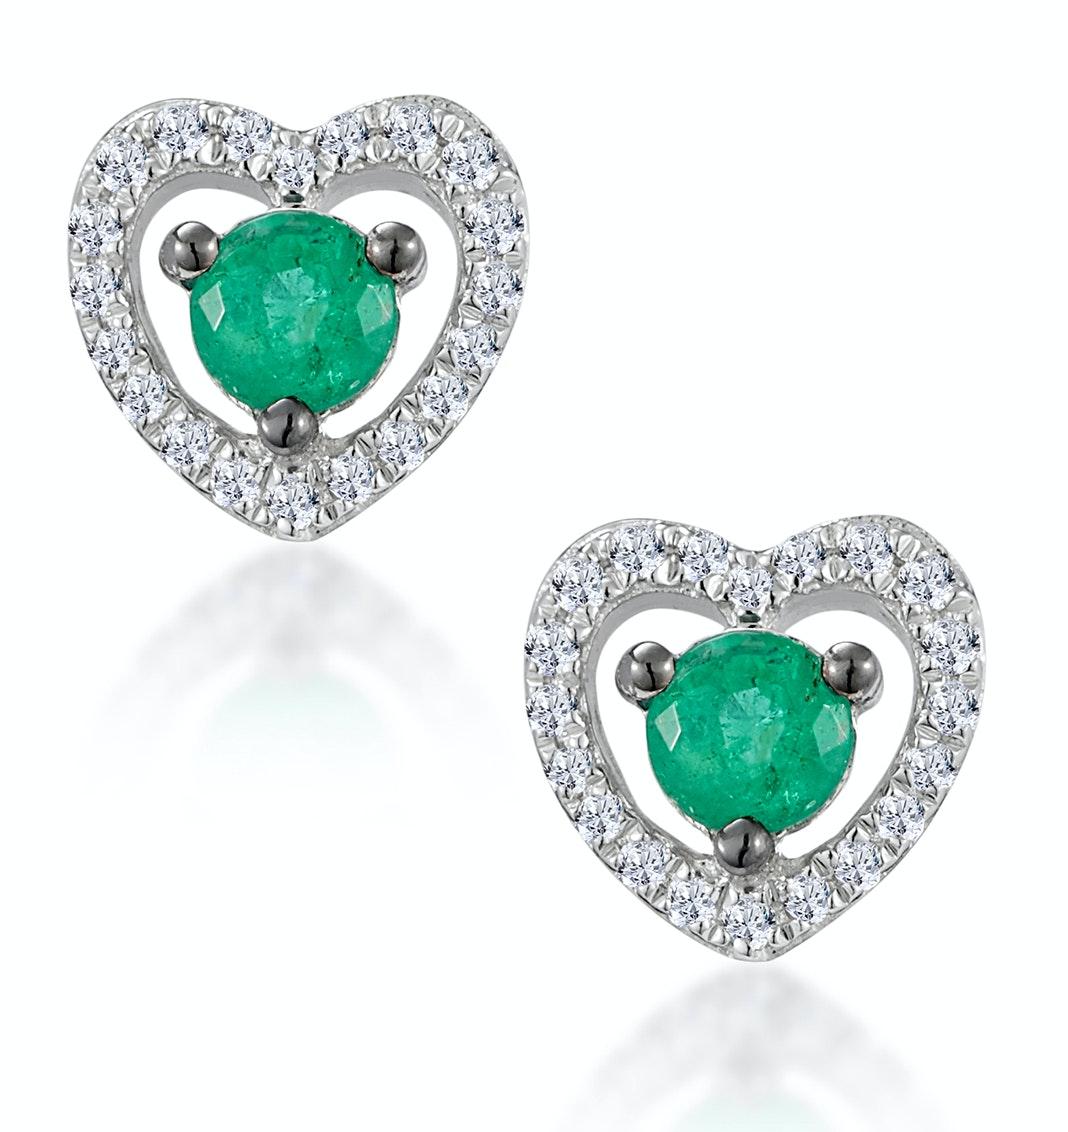 Emerald and Diamond Stellato Heart Earrings in 9K White Gold